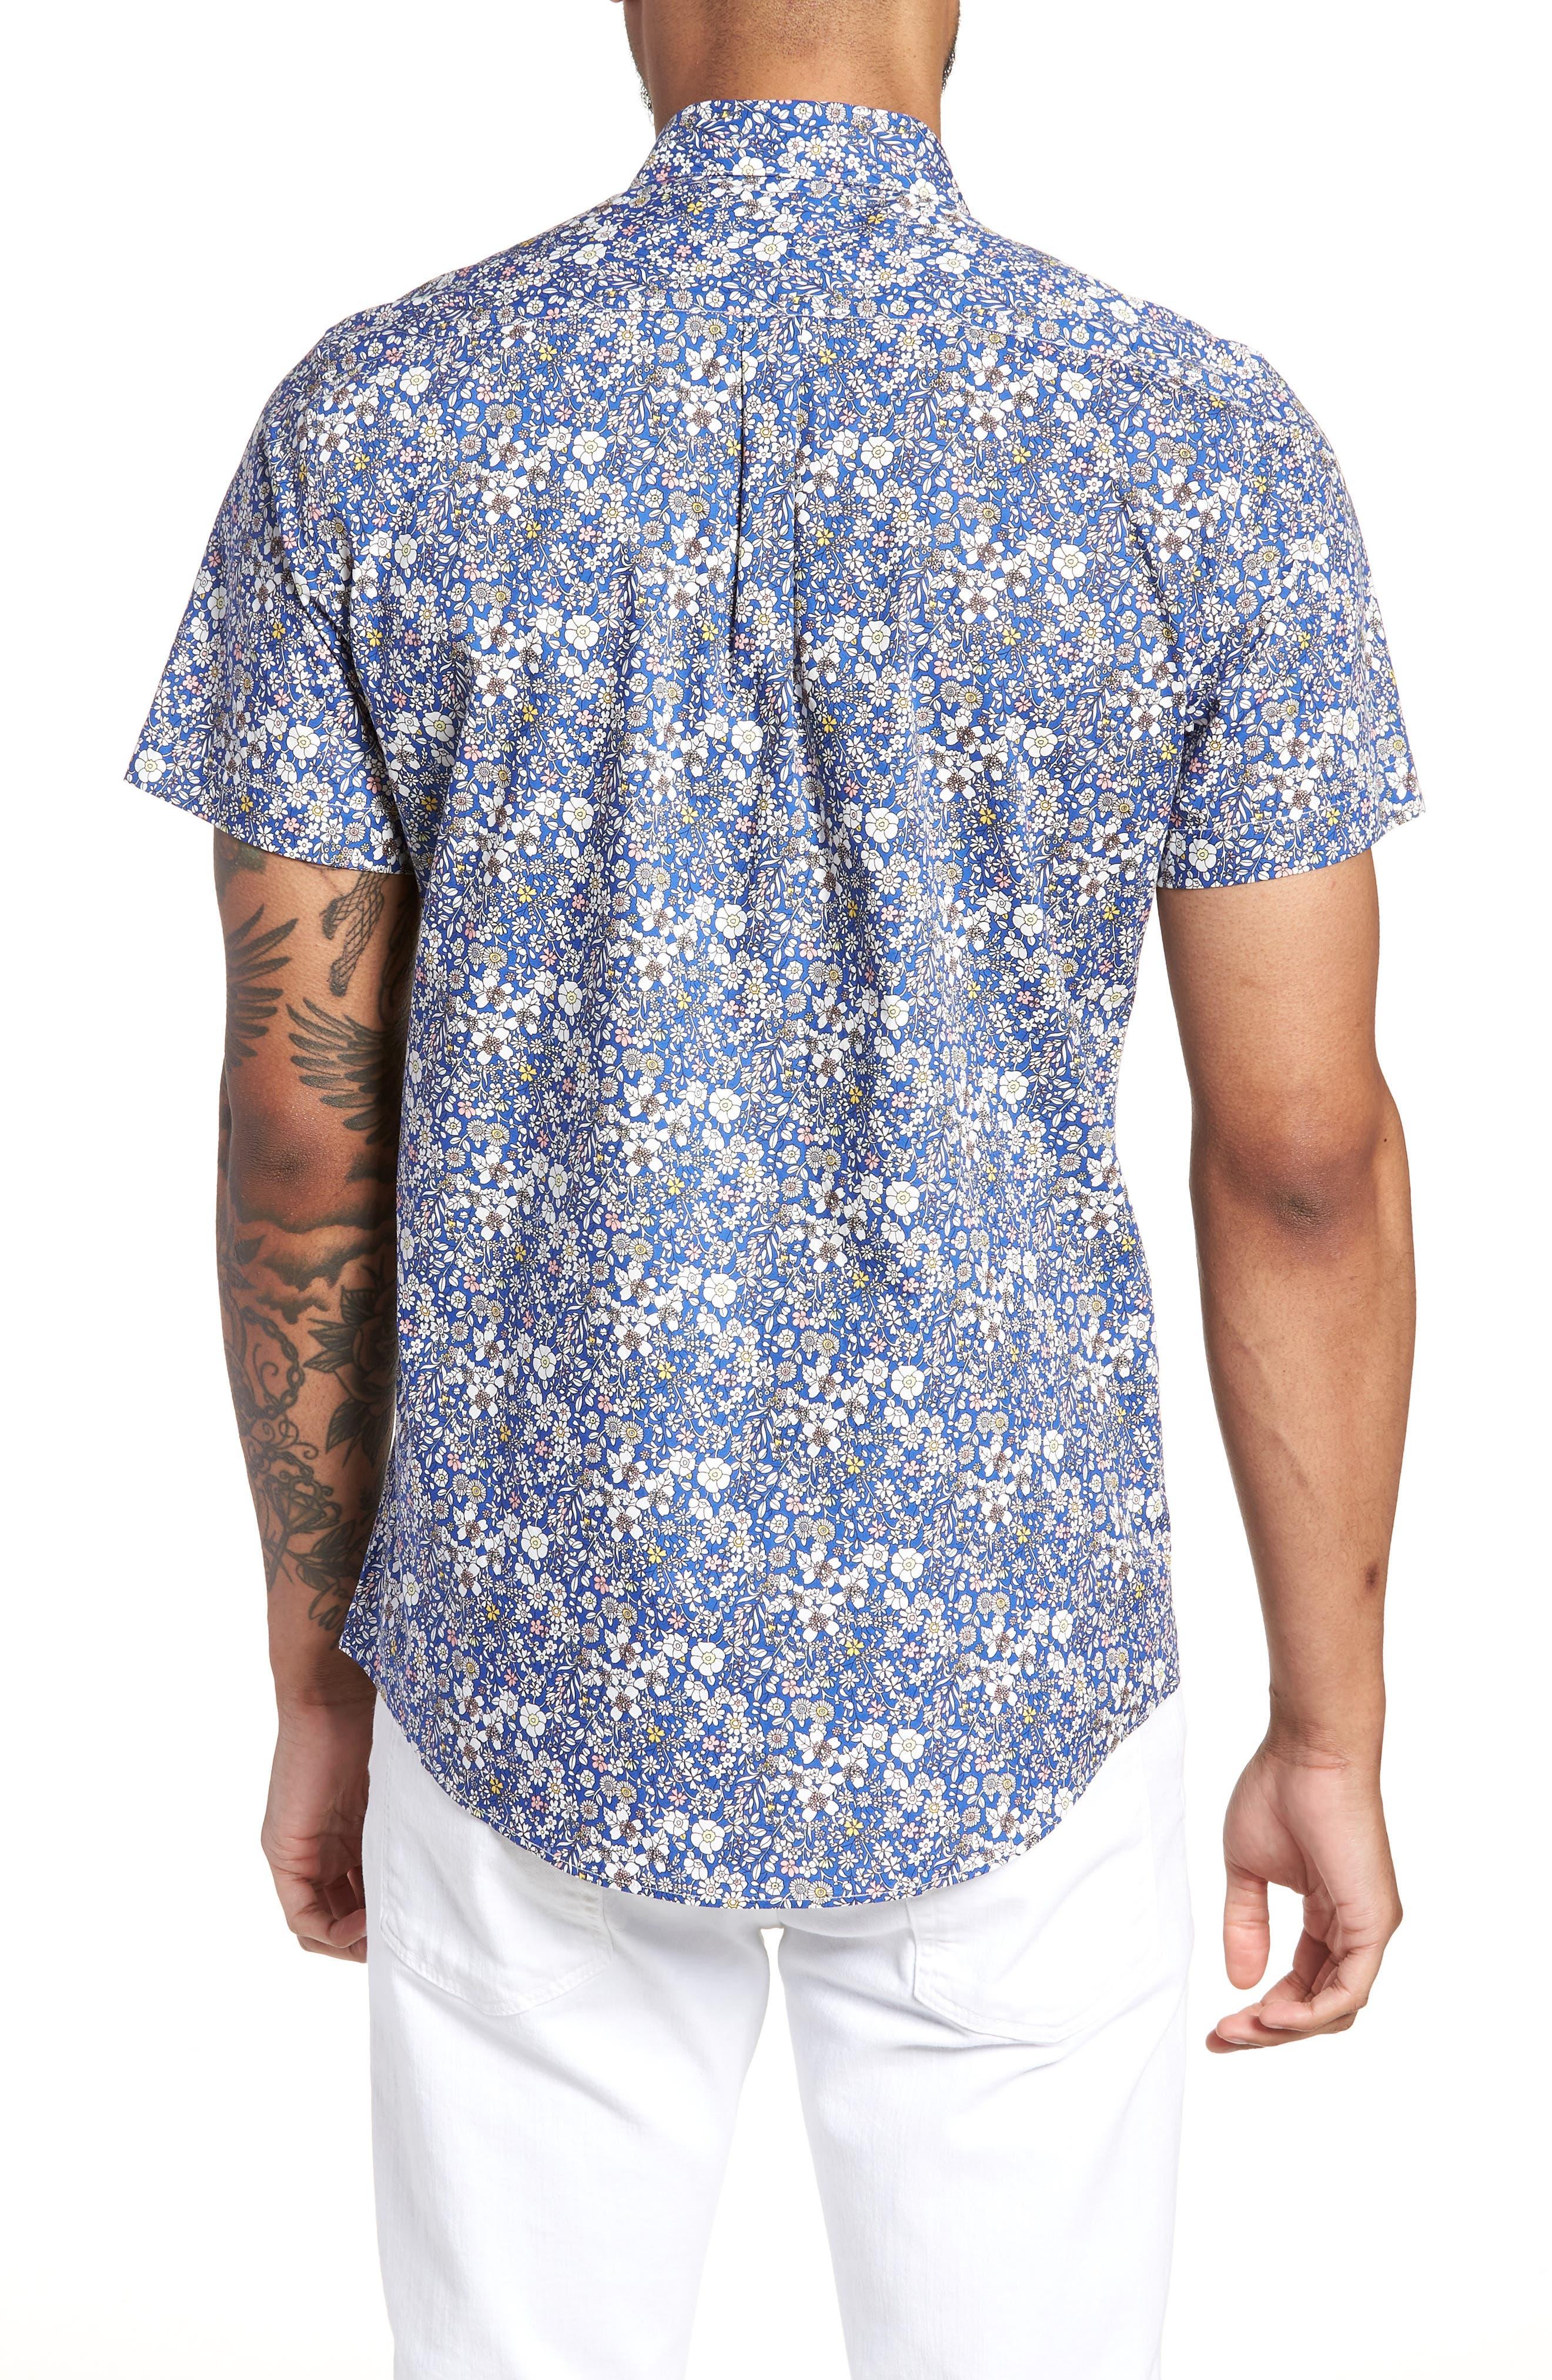 Trim Fit Print Woven Short Sleeve Shirt,                             Alternate thumbnail 2, color,                             Blue Pink Floral